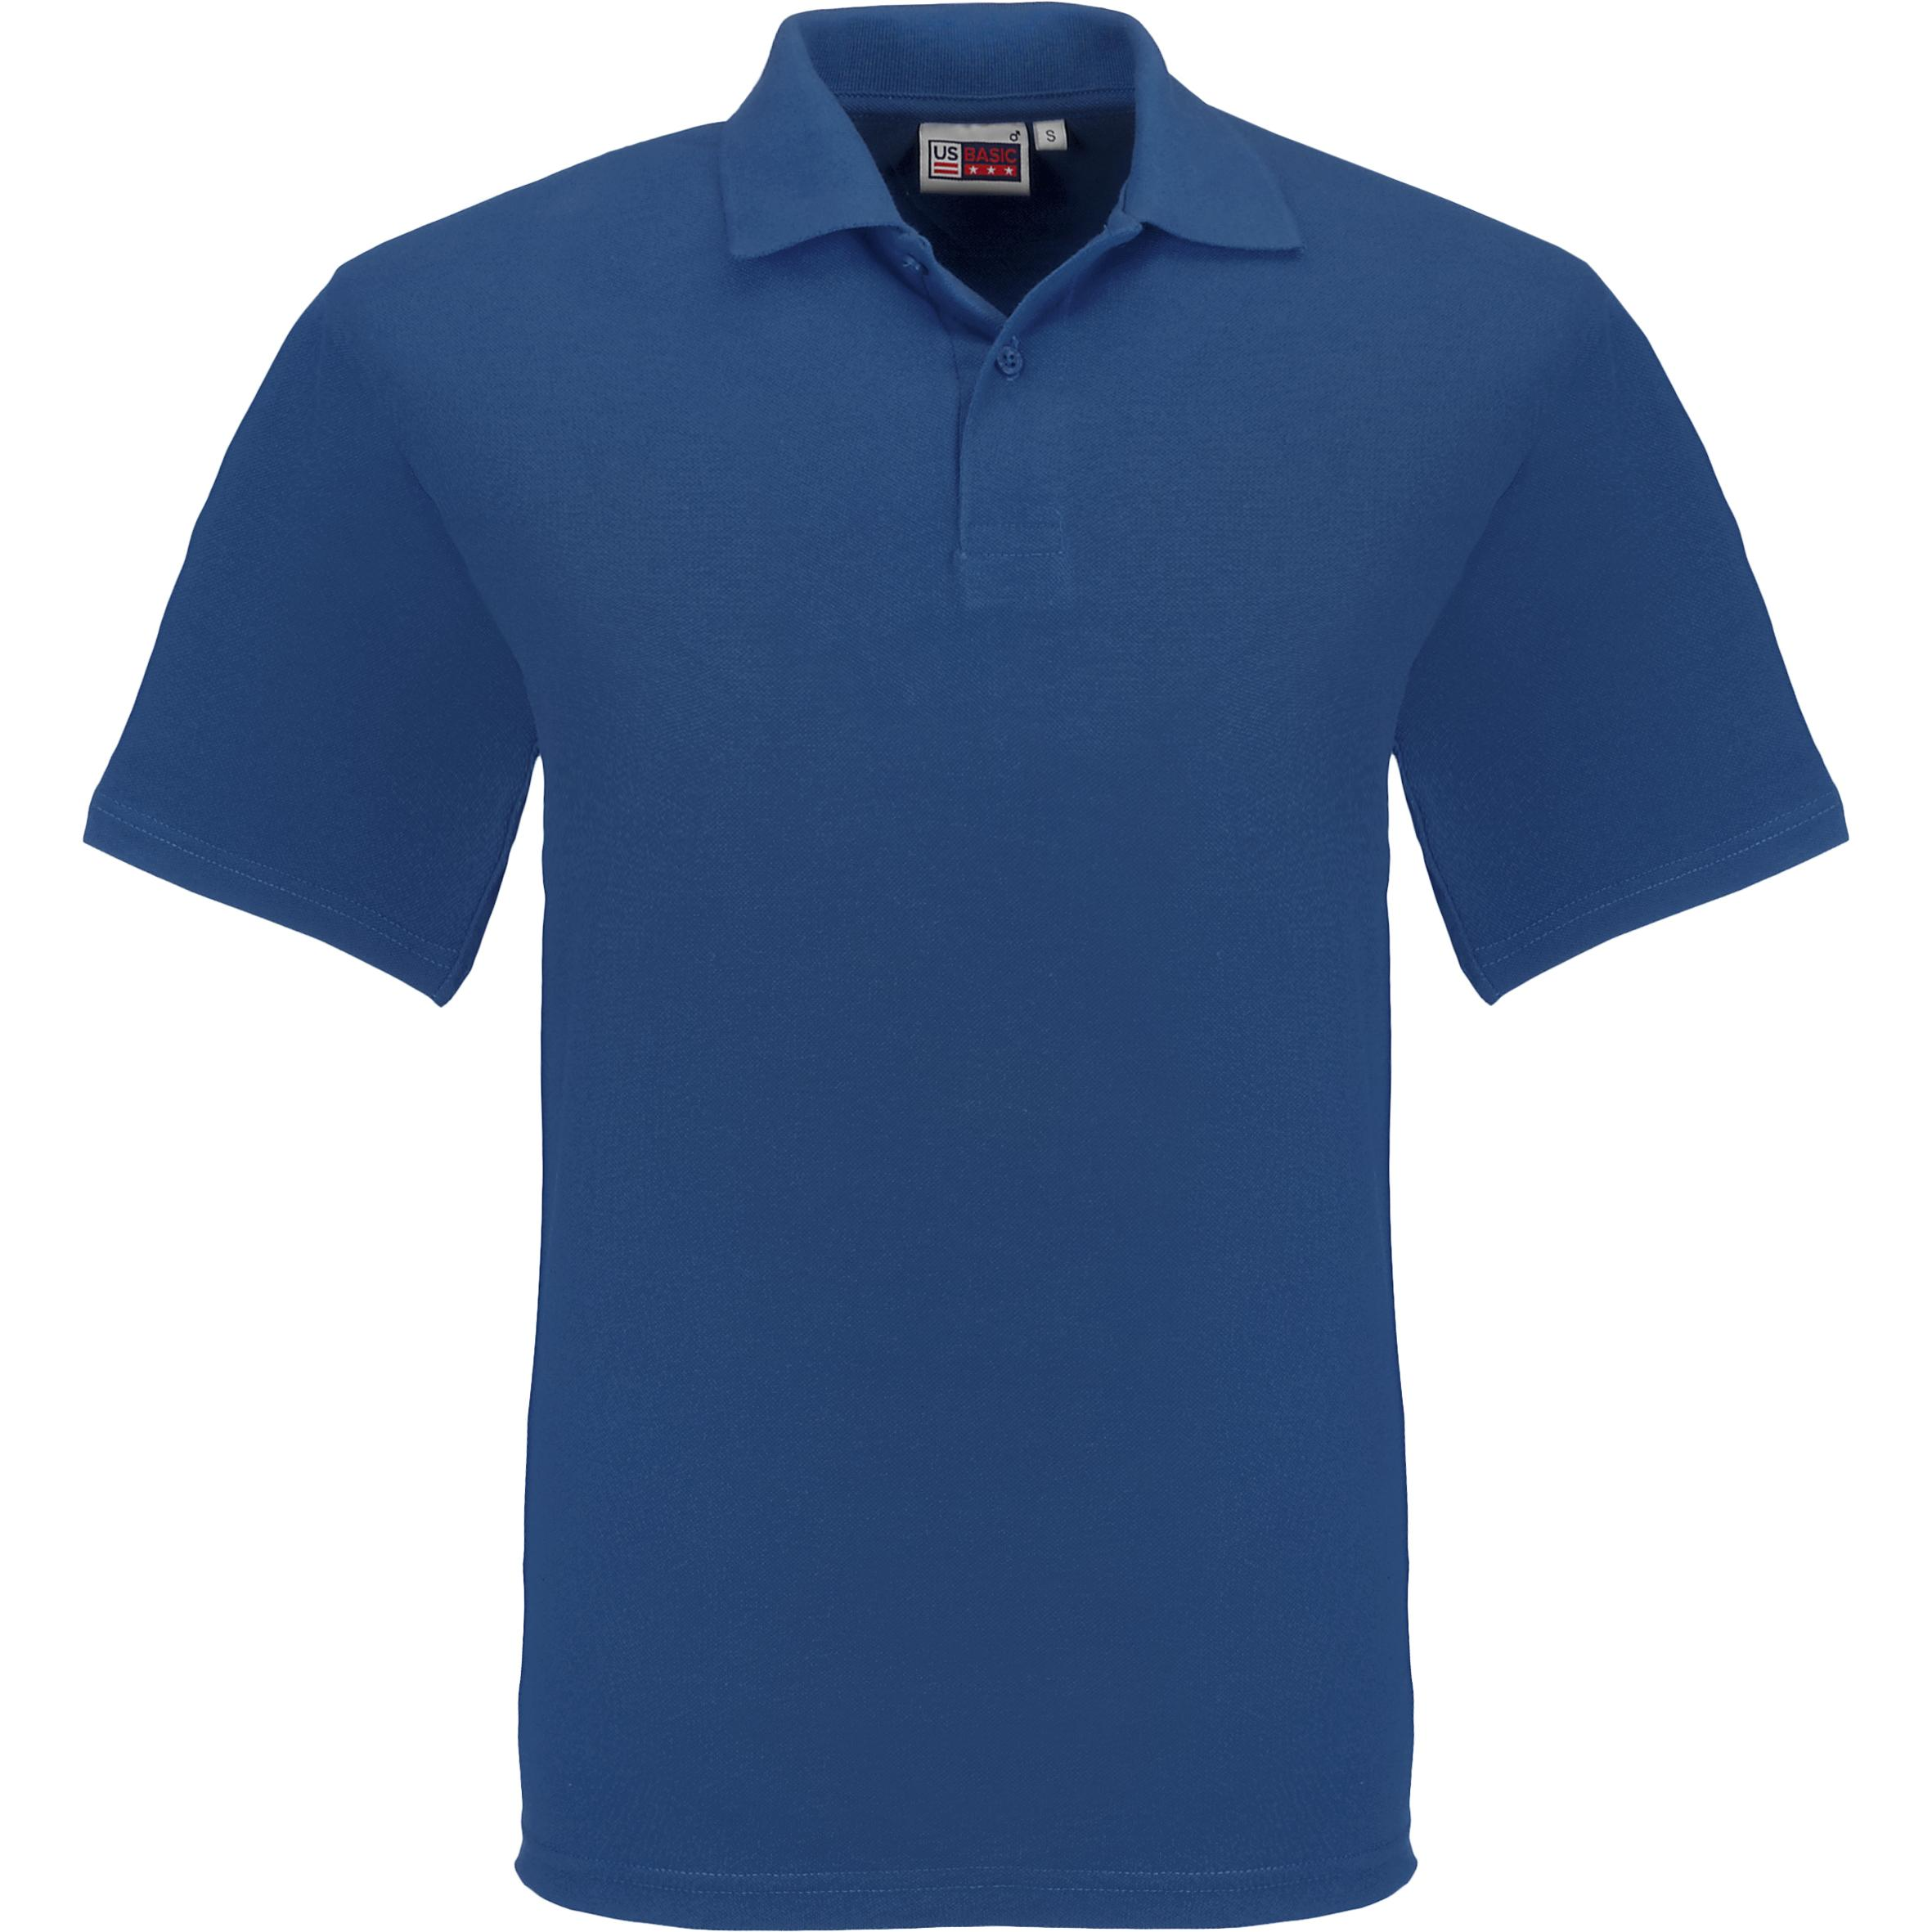 Kids Elemental Golf Shirt - Royal Blue Only